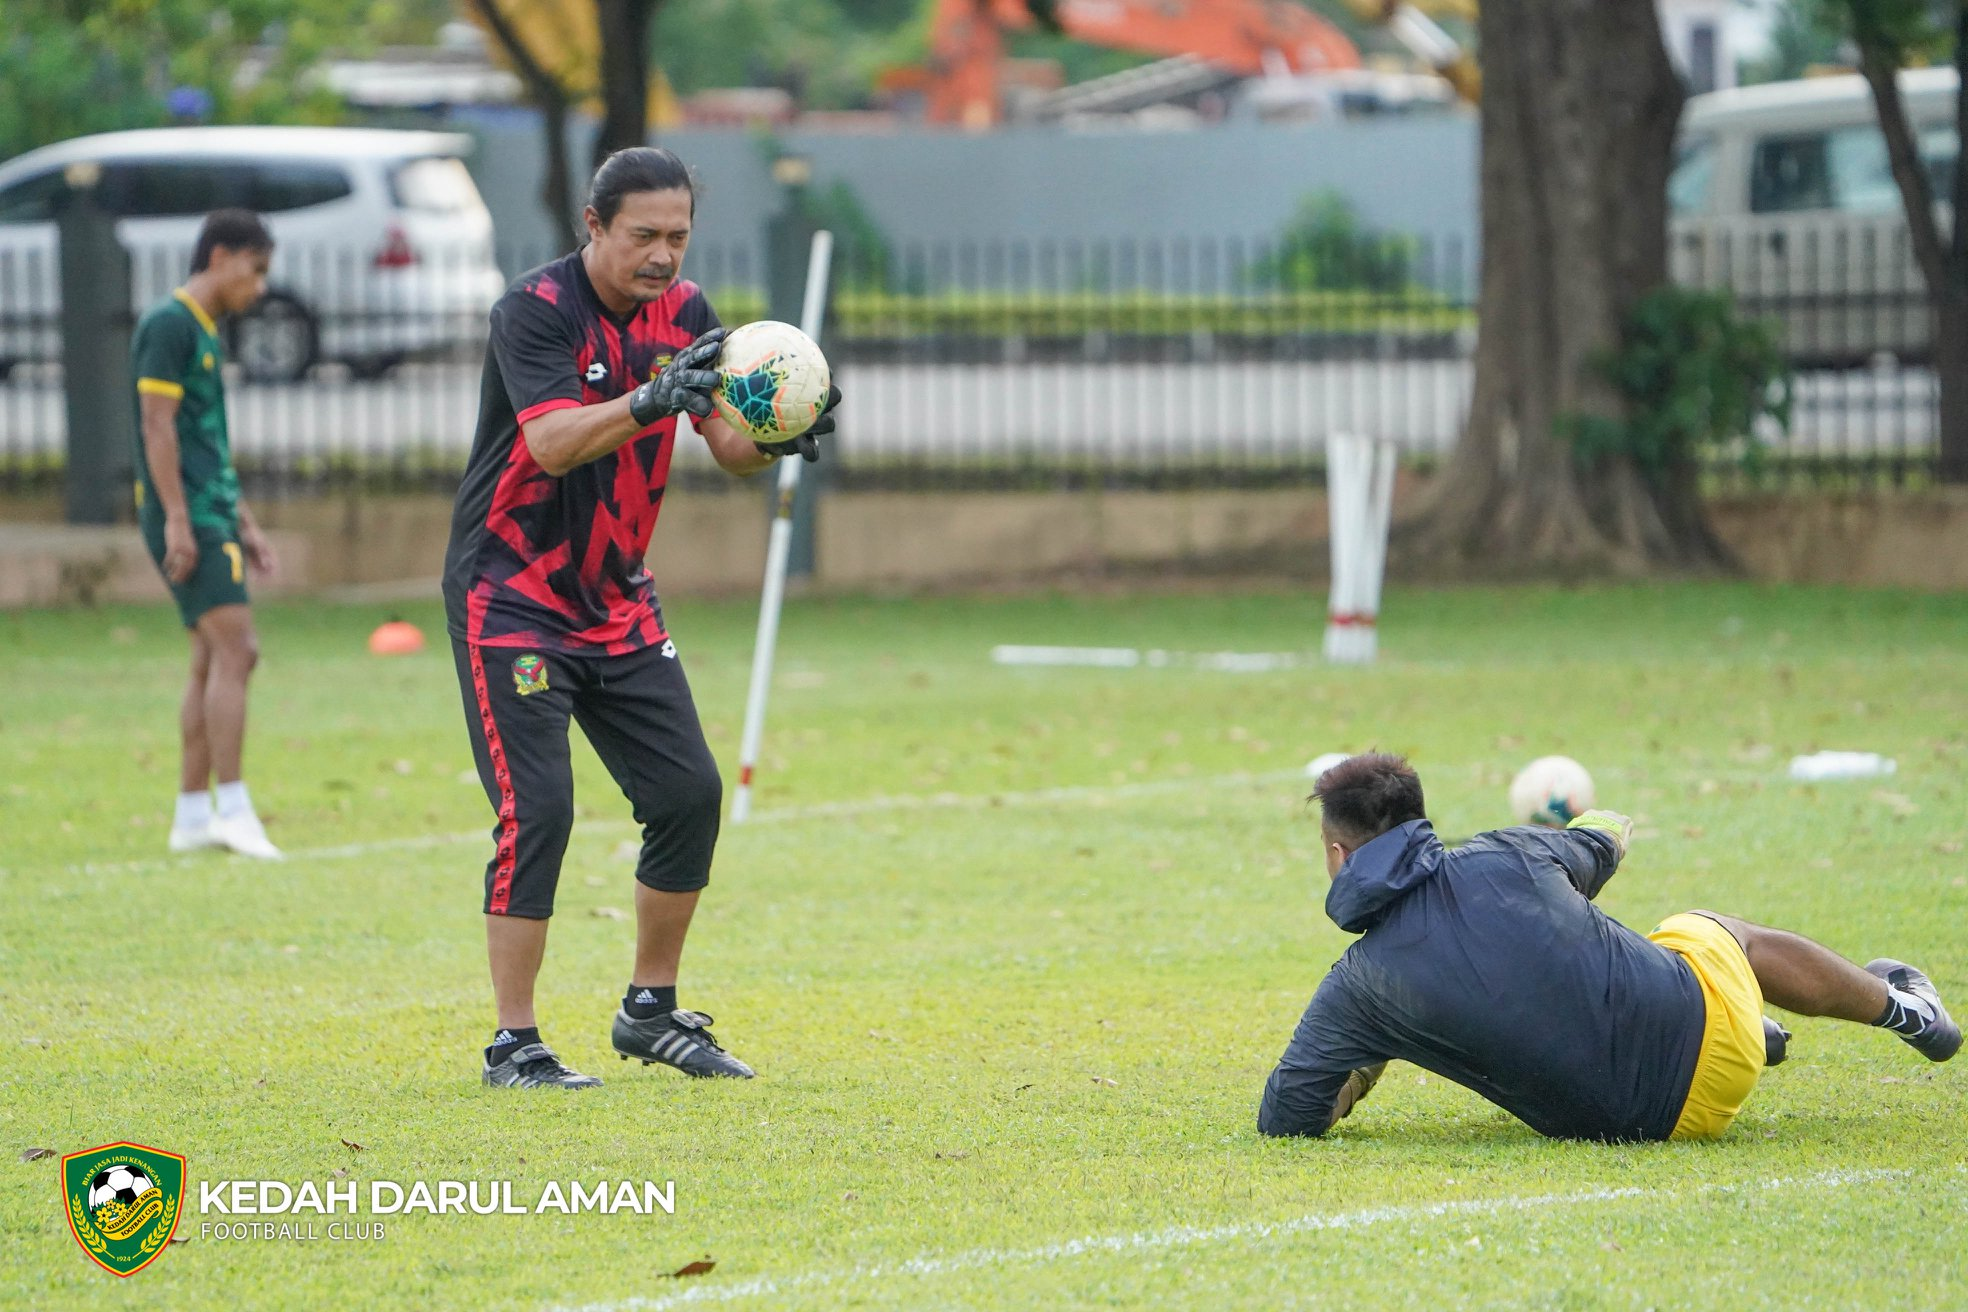 Khairul Azman Mohamed Ifwat Akmal Kedah Darul Aman FC 2021